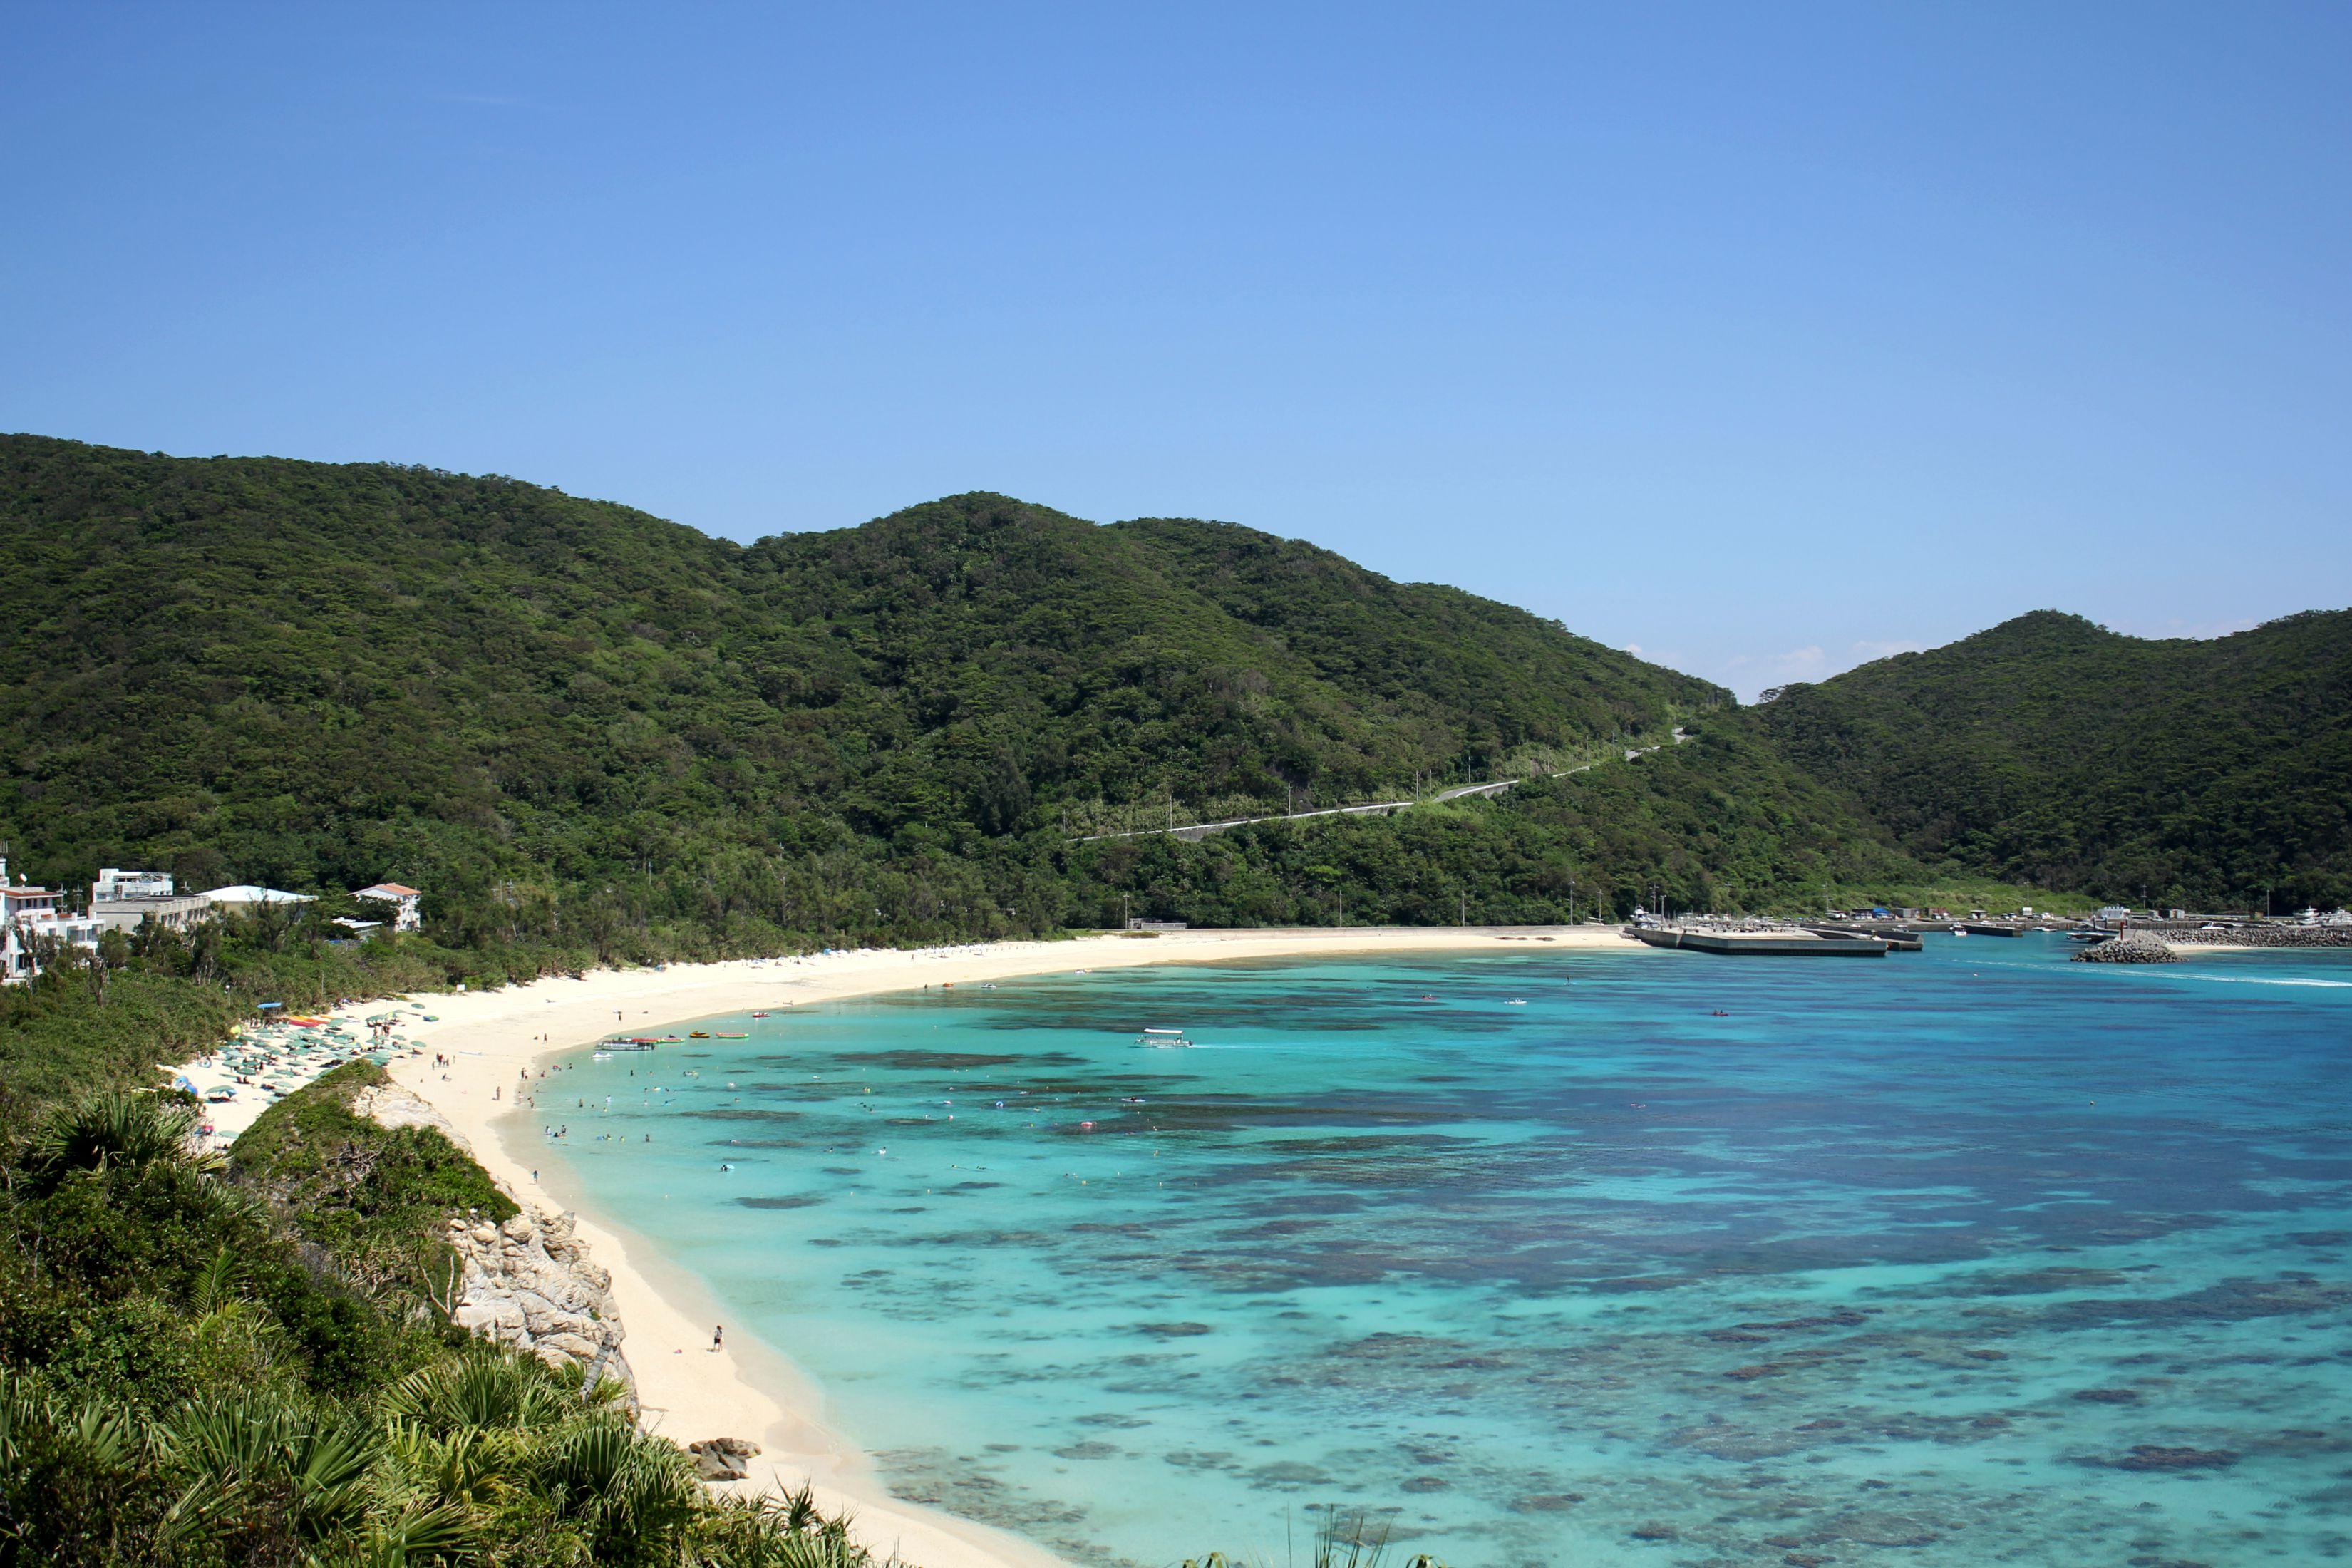 Kerama Islands: Tokashiki